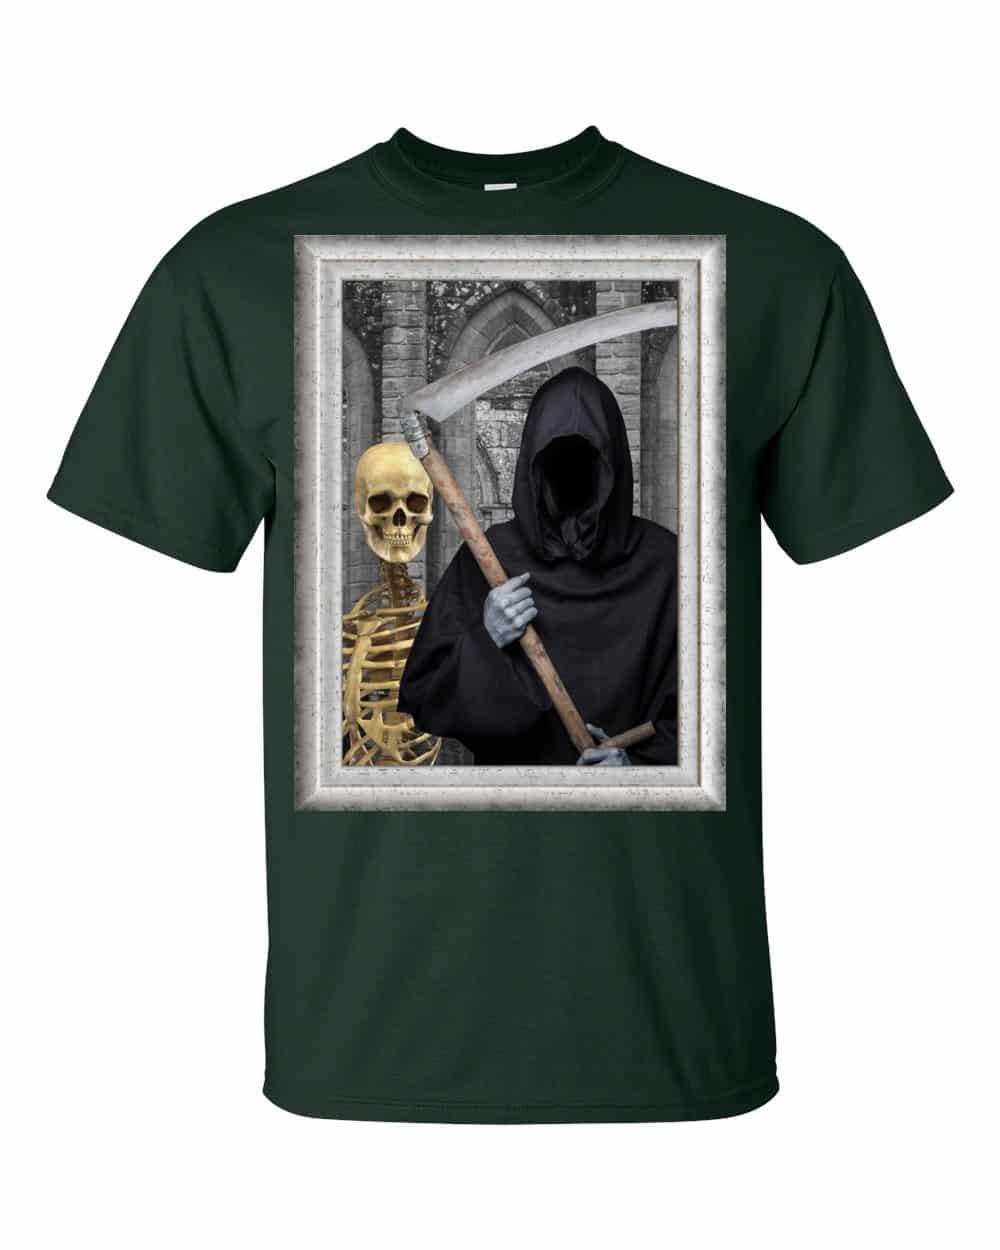 Transylvanian Gothic T-Shirt (Unisex)